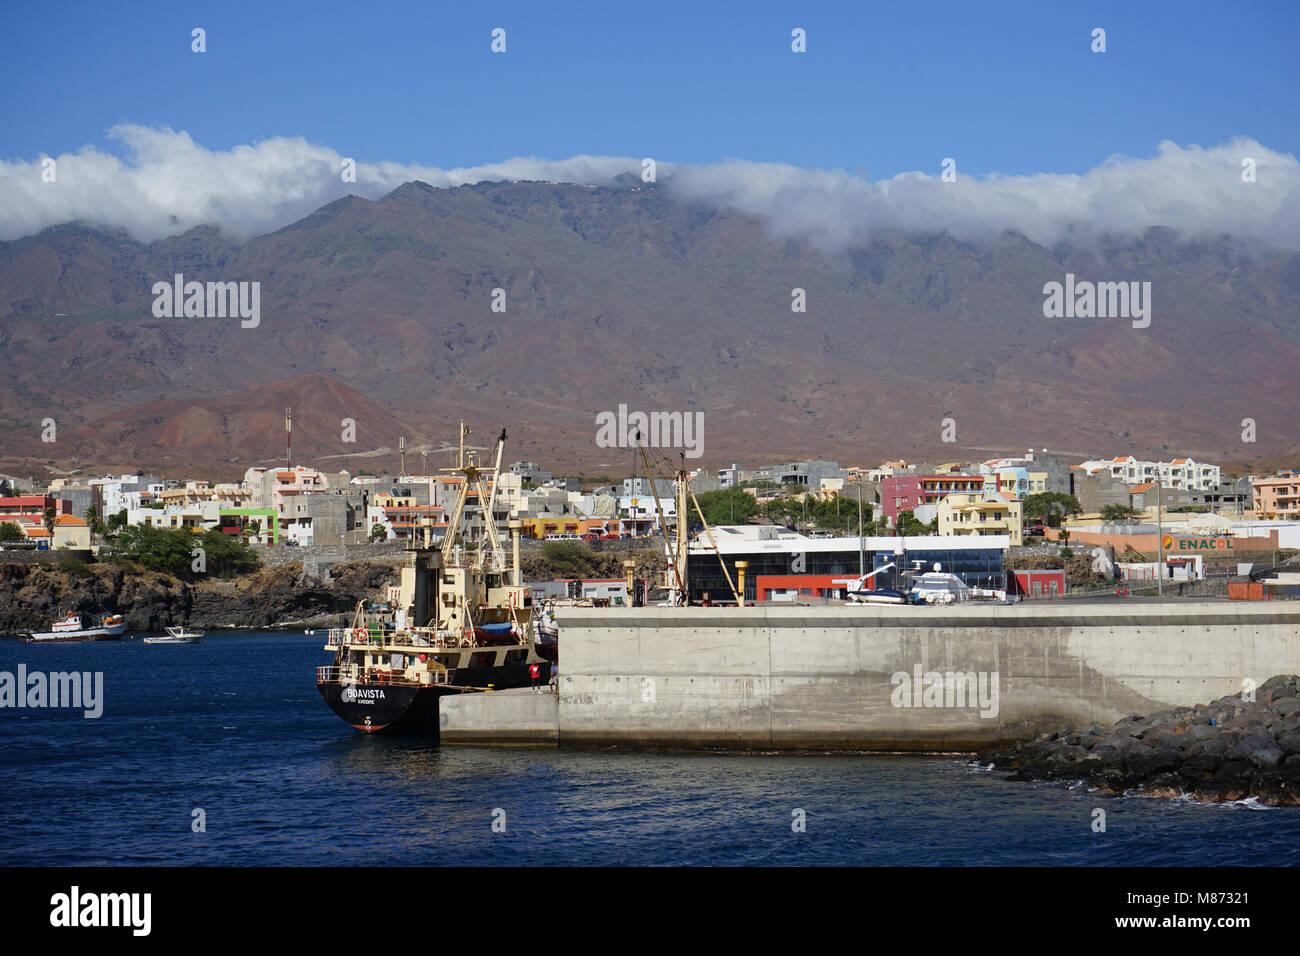 Port of Porto Novo, Santo Antao Island, Cape Verde - Stock Image